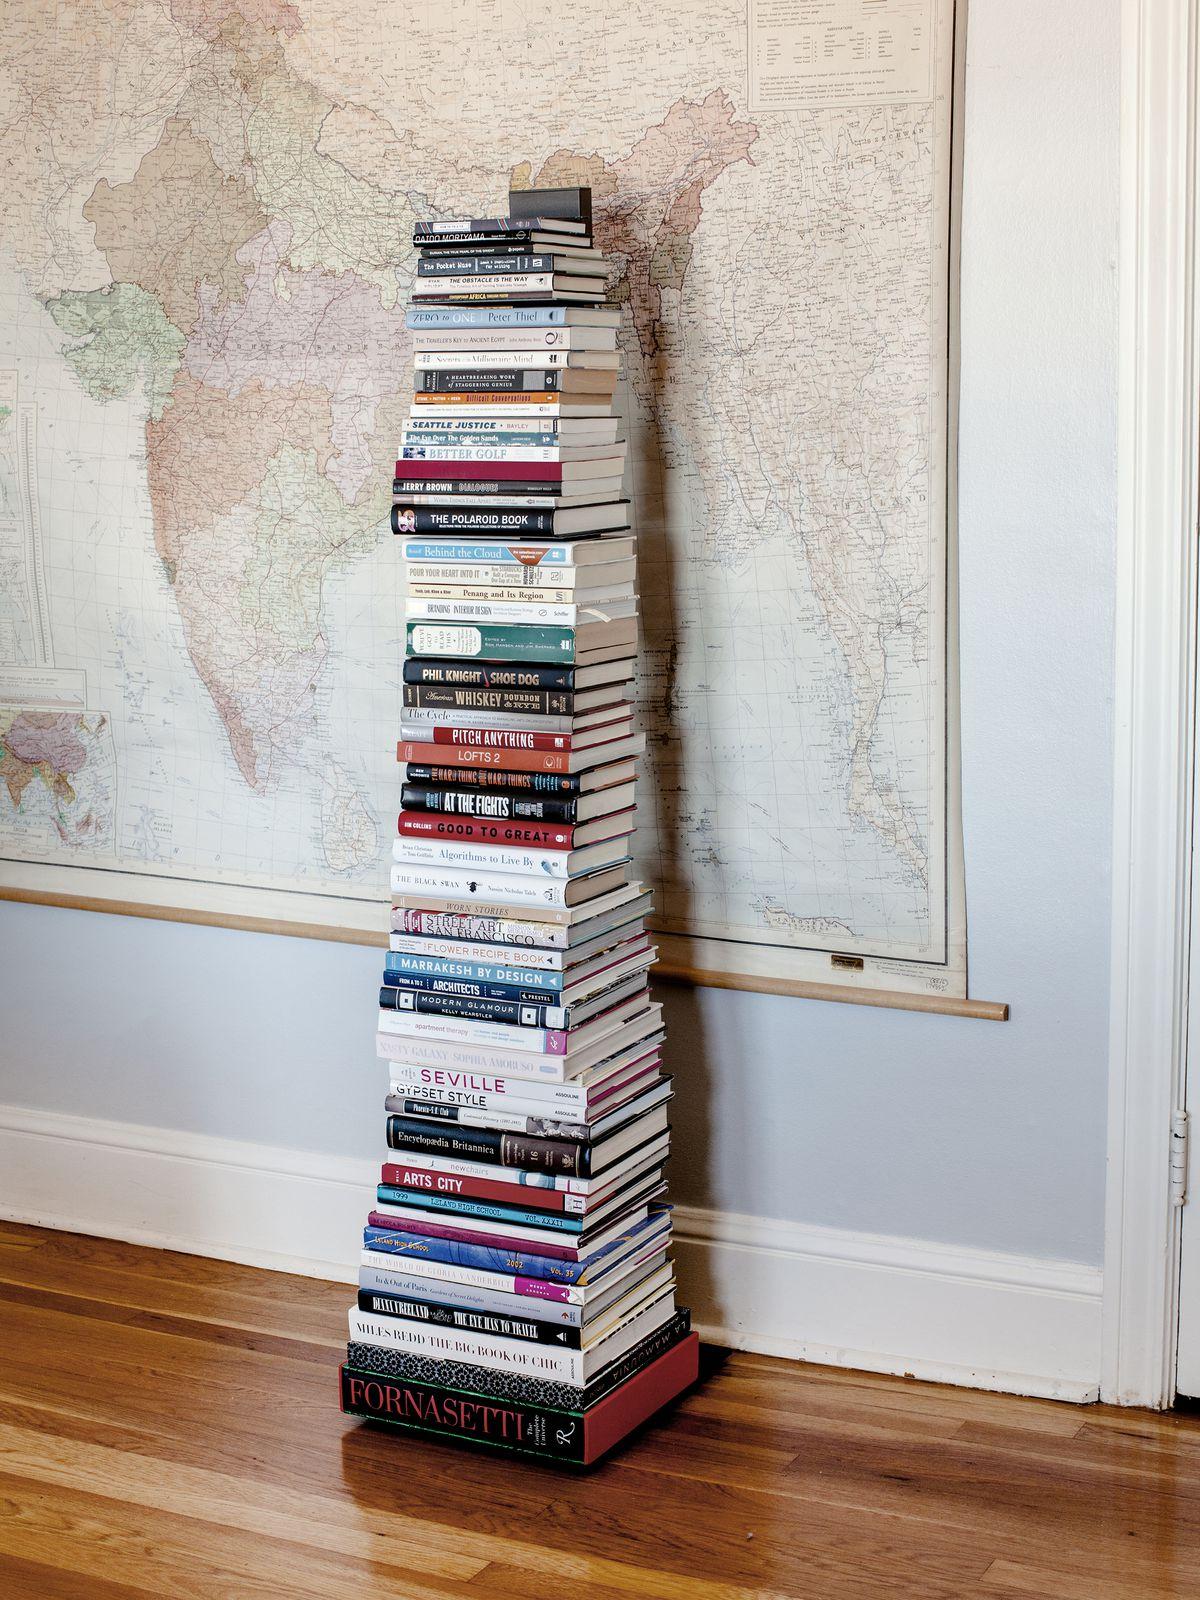 A tower bookshelf holds many books.